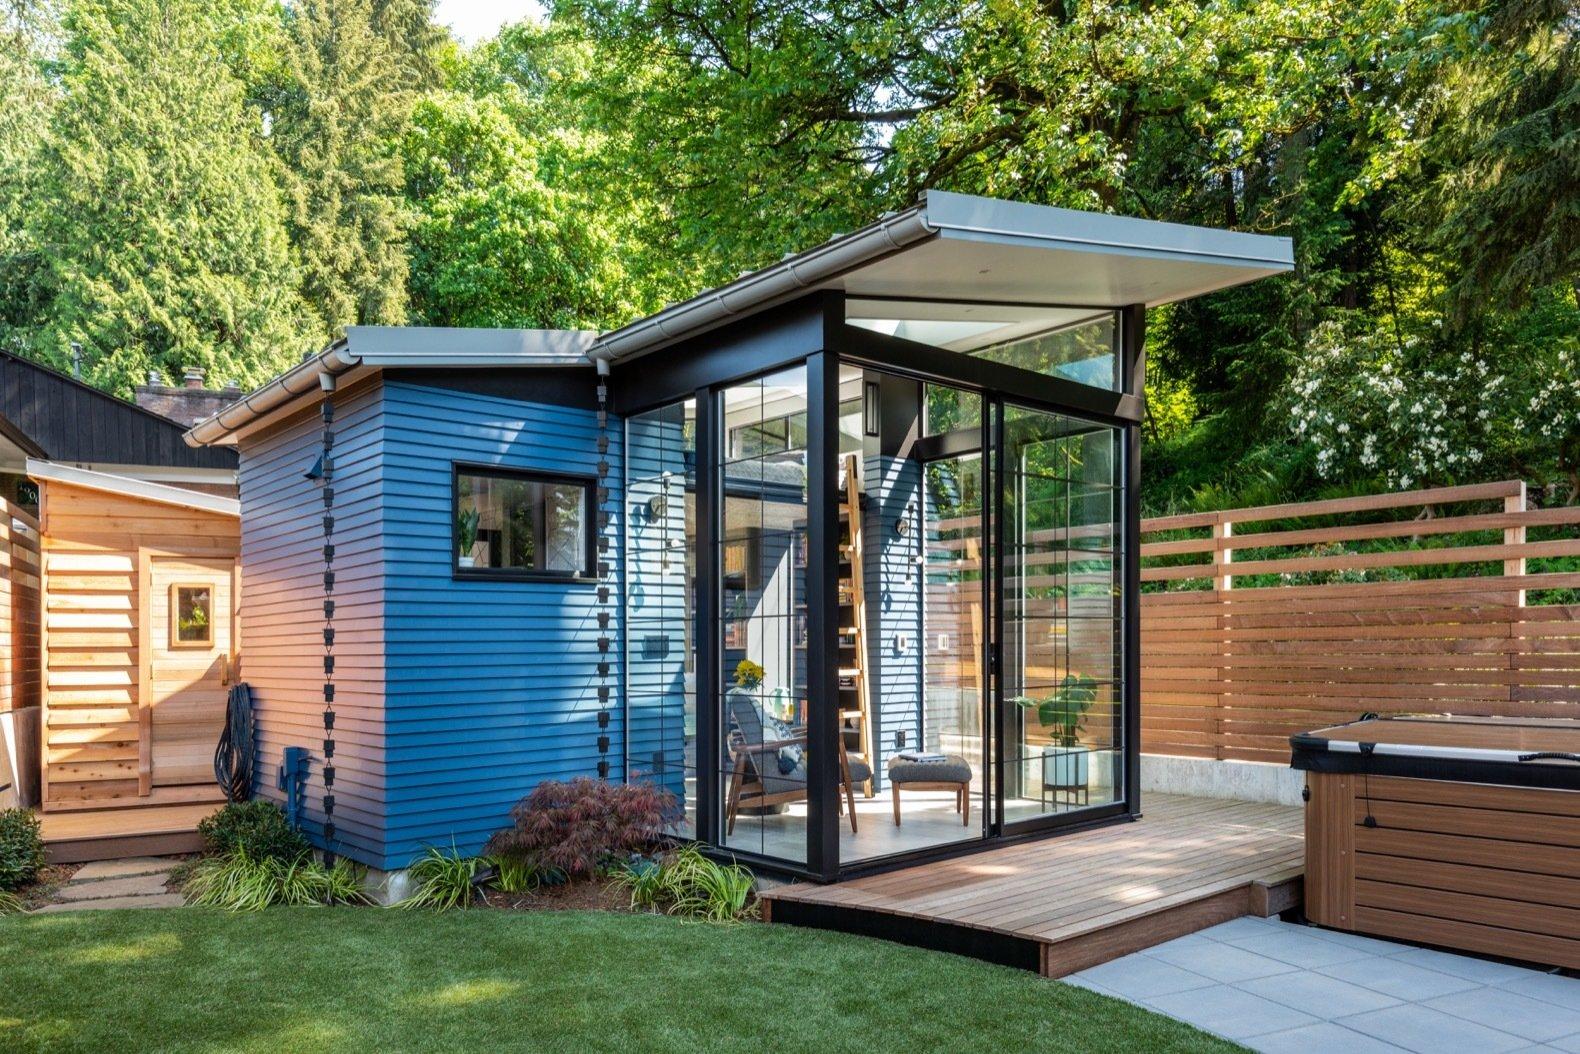 blue-painted-cedar-siding-wraps-around-the-169-square-foot